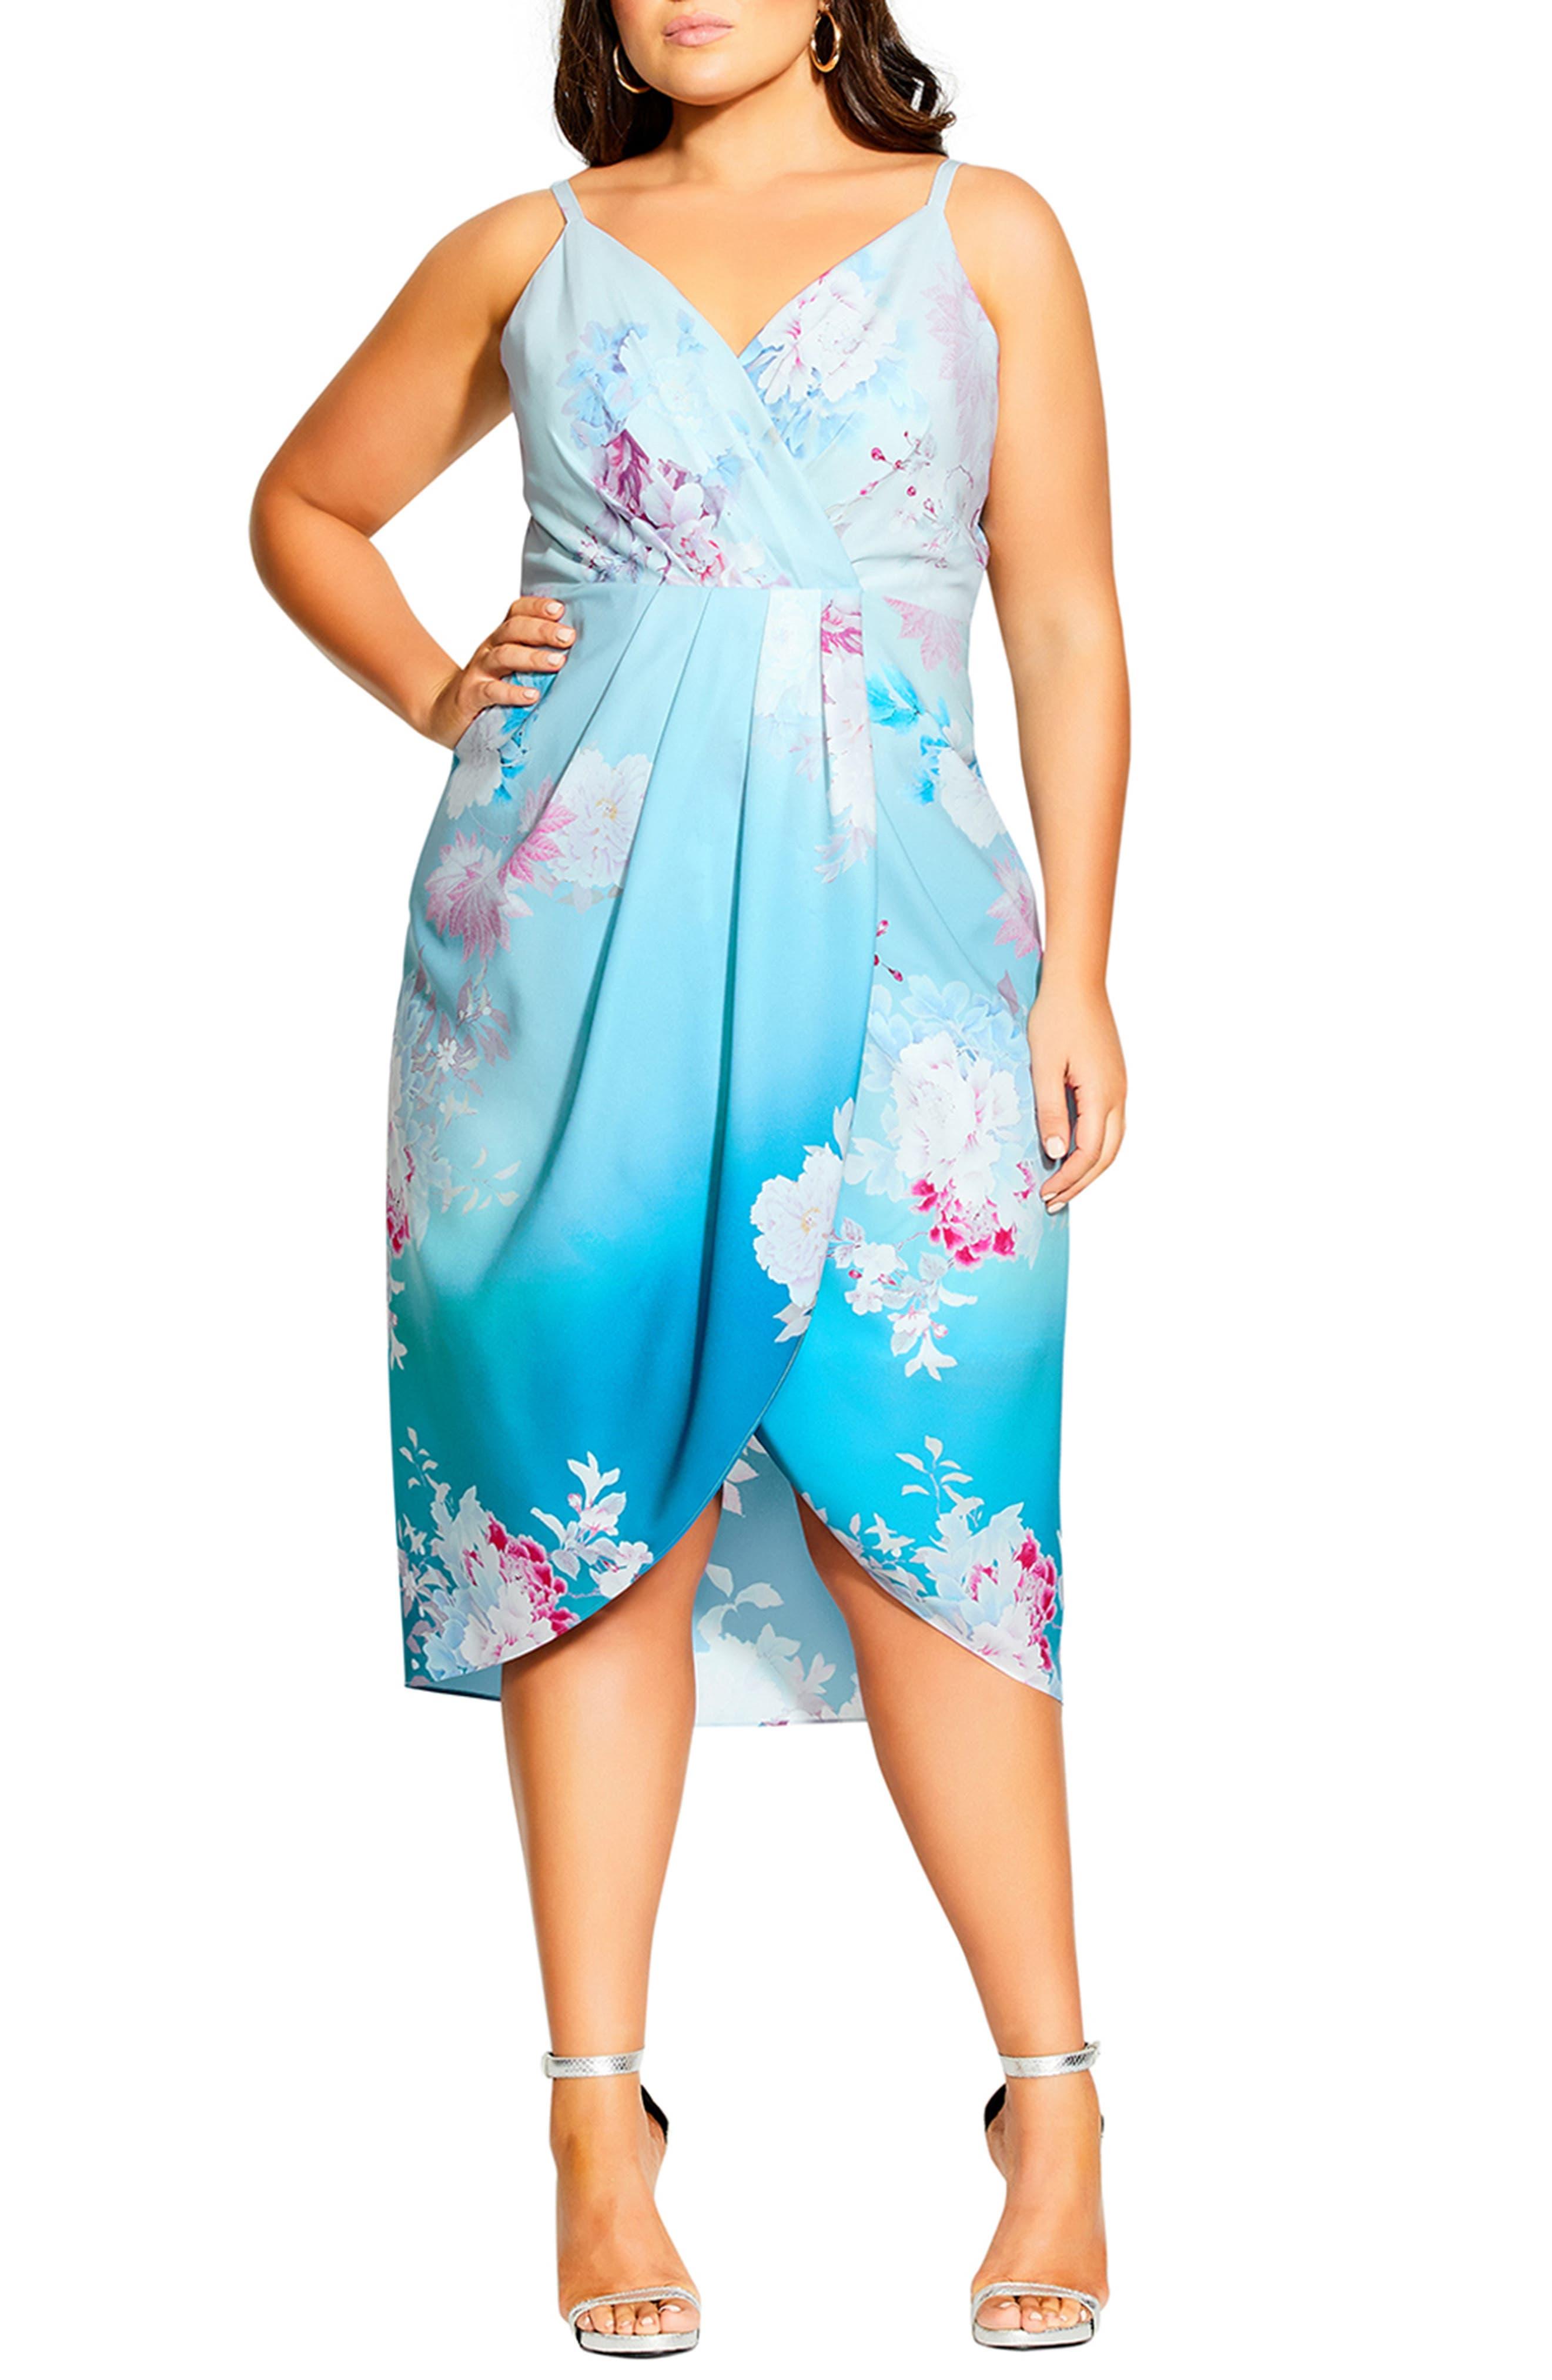 Tsubaki Love Floral Sleeveless Midi Dress